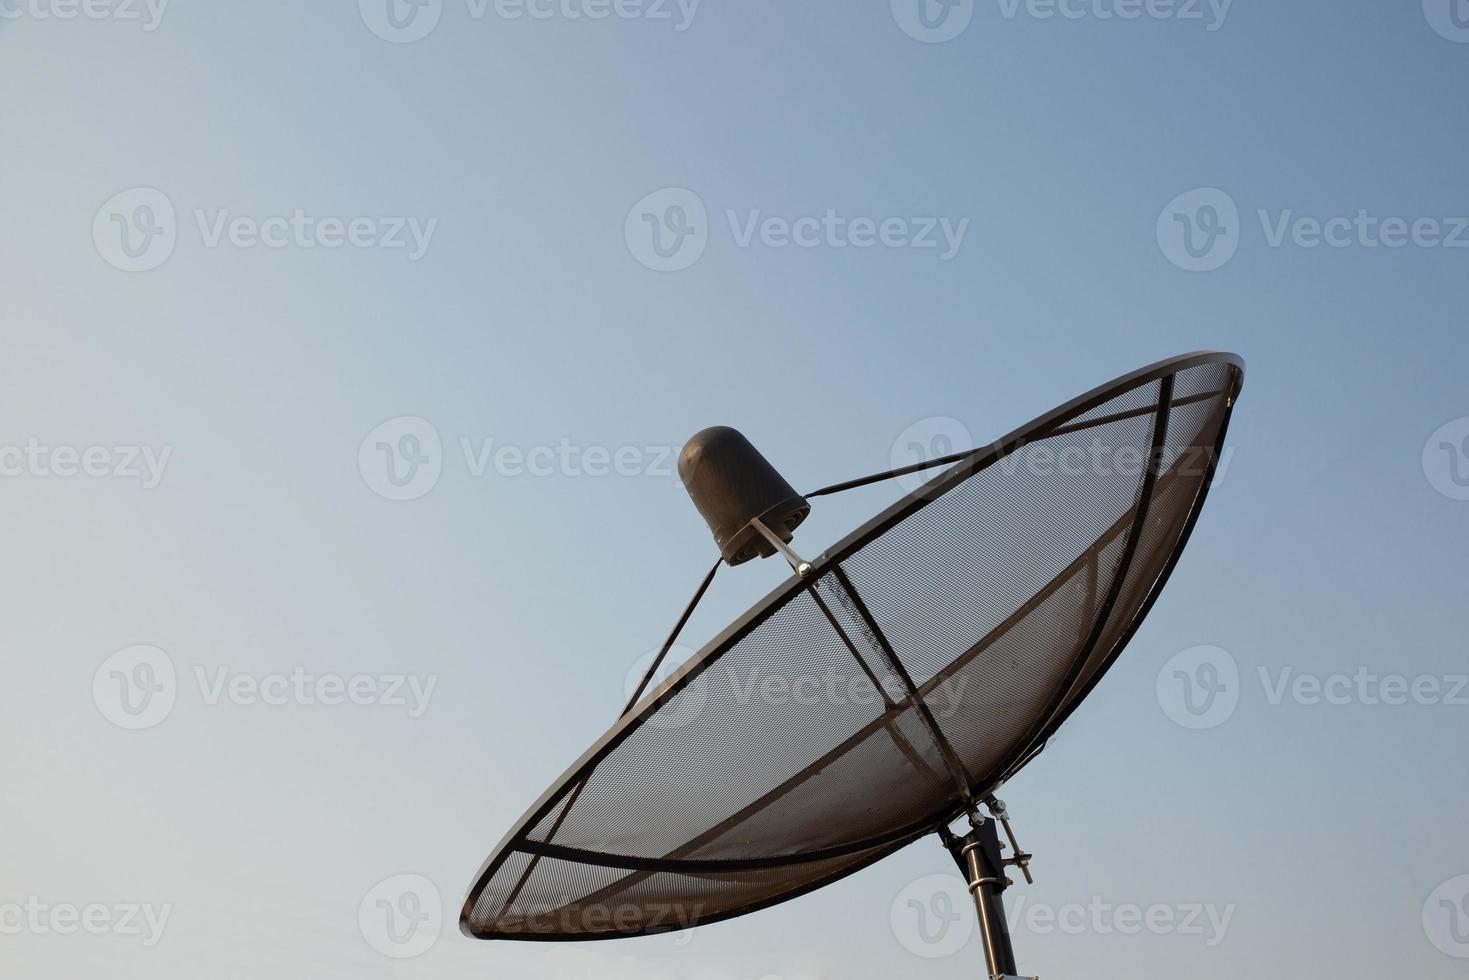 große schwarze Satellitenschüssel. foto